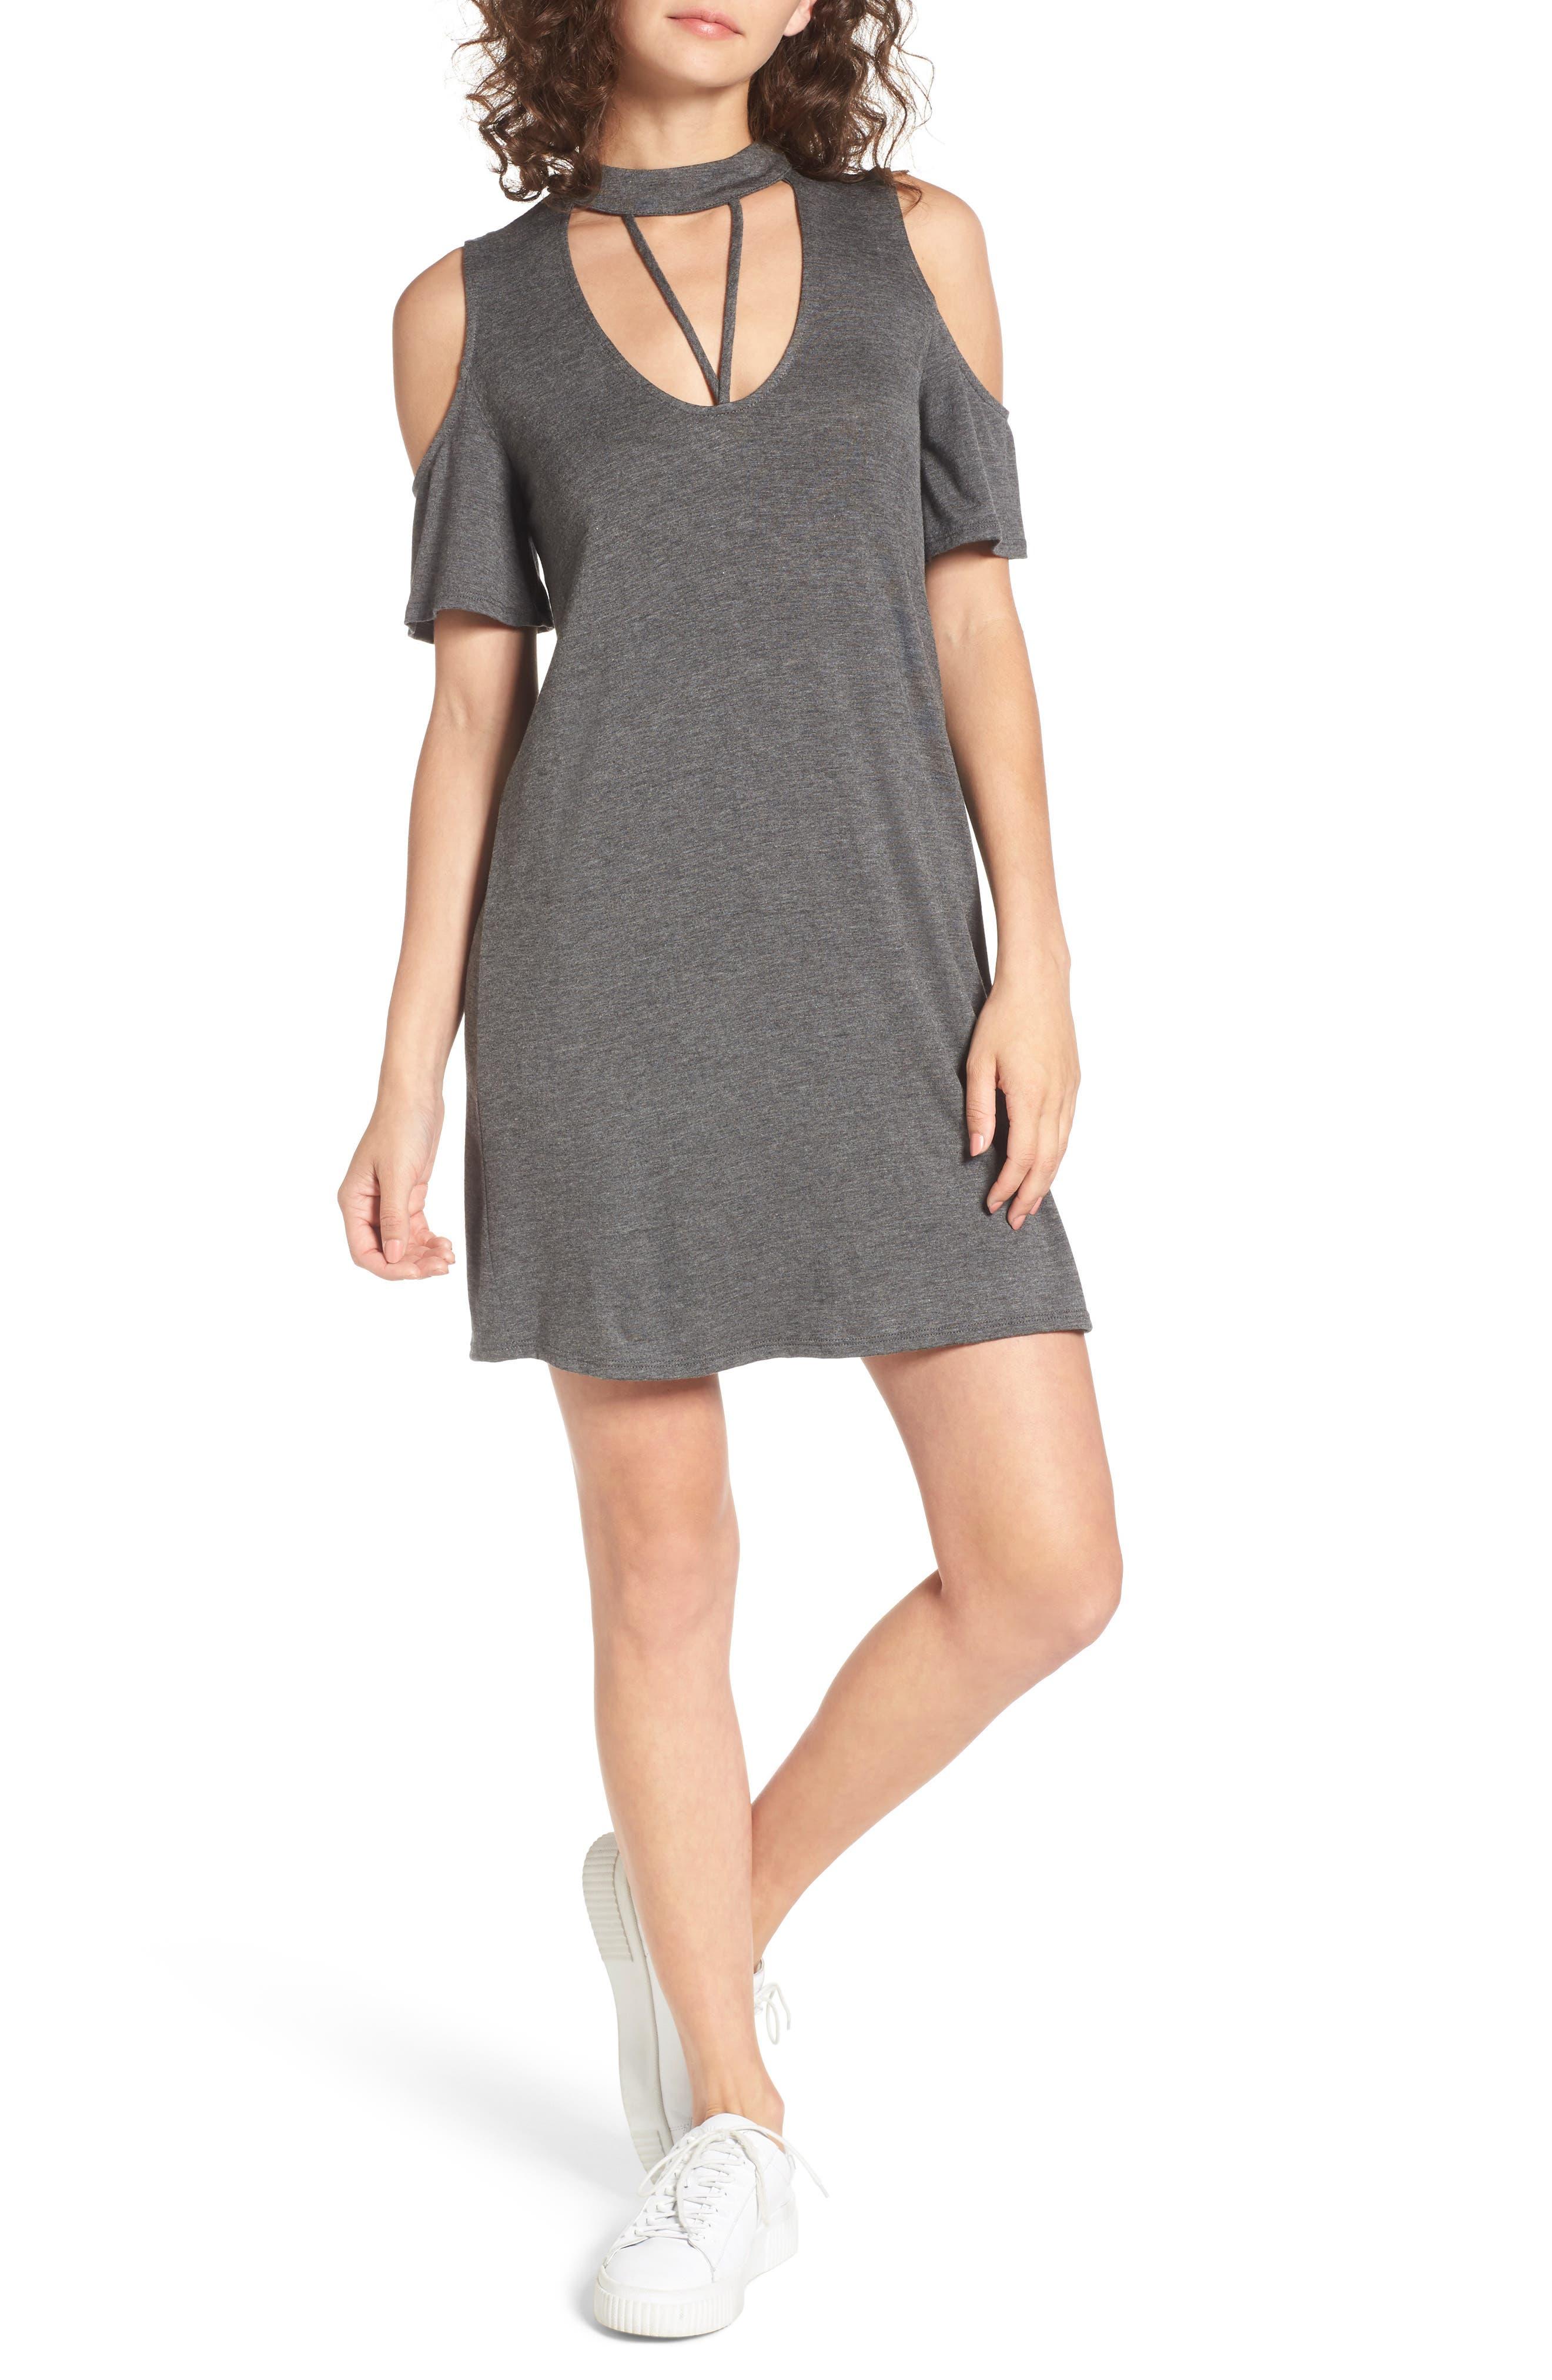 Dee Elly Strappy Choker T-Shirt Dress